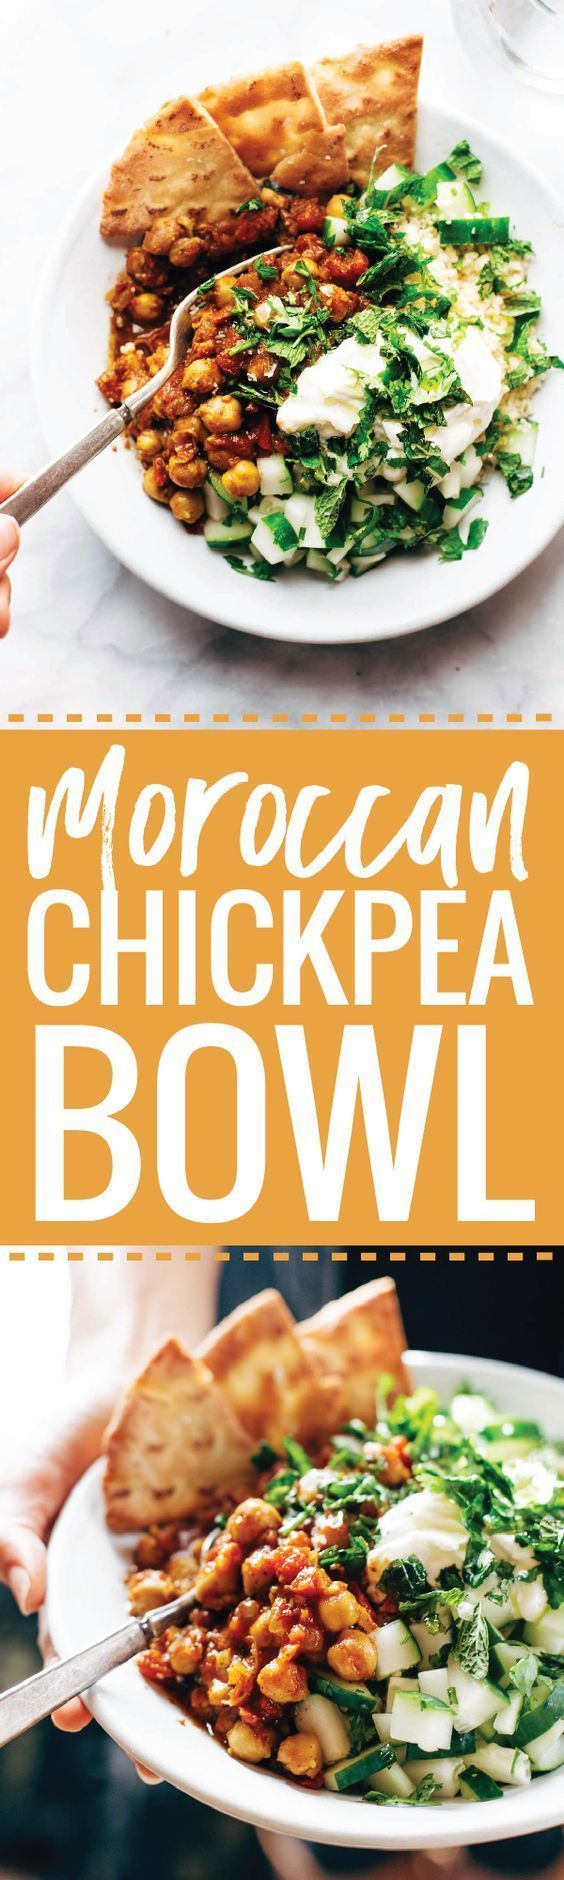 Detox Moroccan Chickpea Glow Bowls: clean eating meets comfort food! vegetarian / vegan. | http://pinchofyum.com